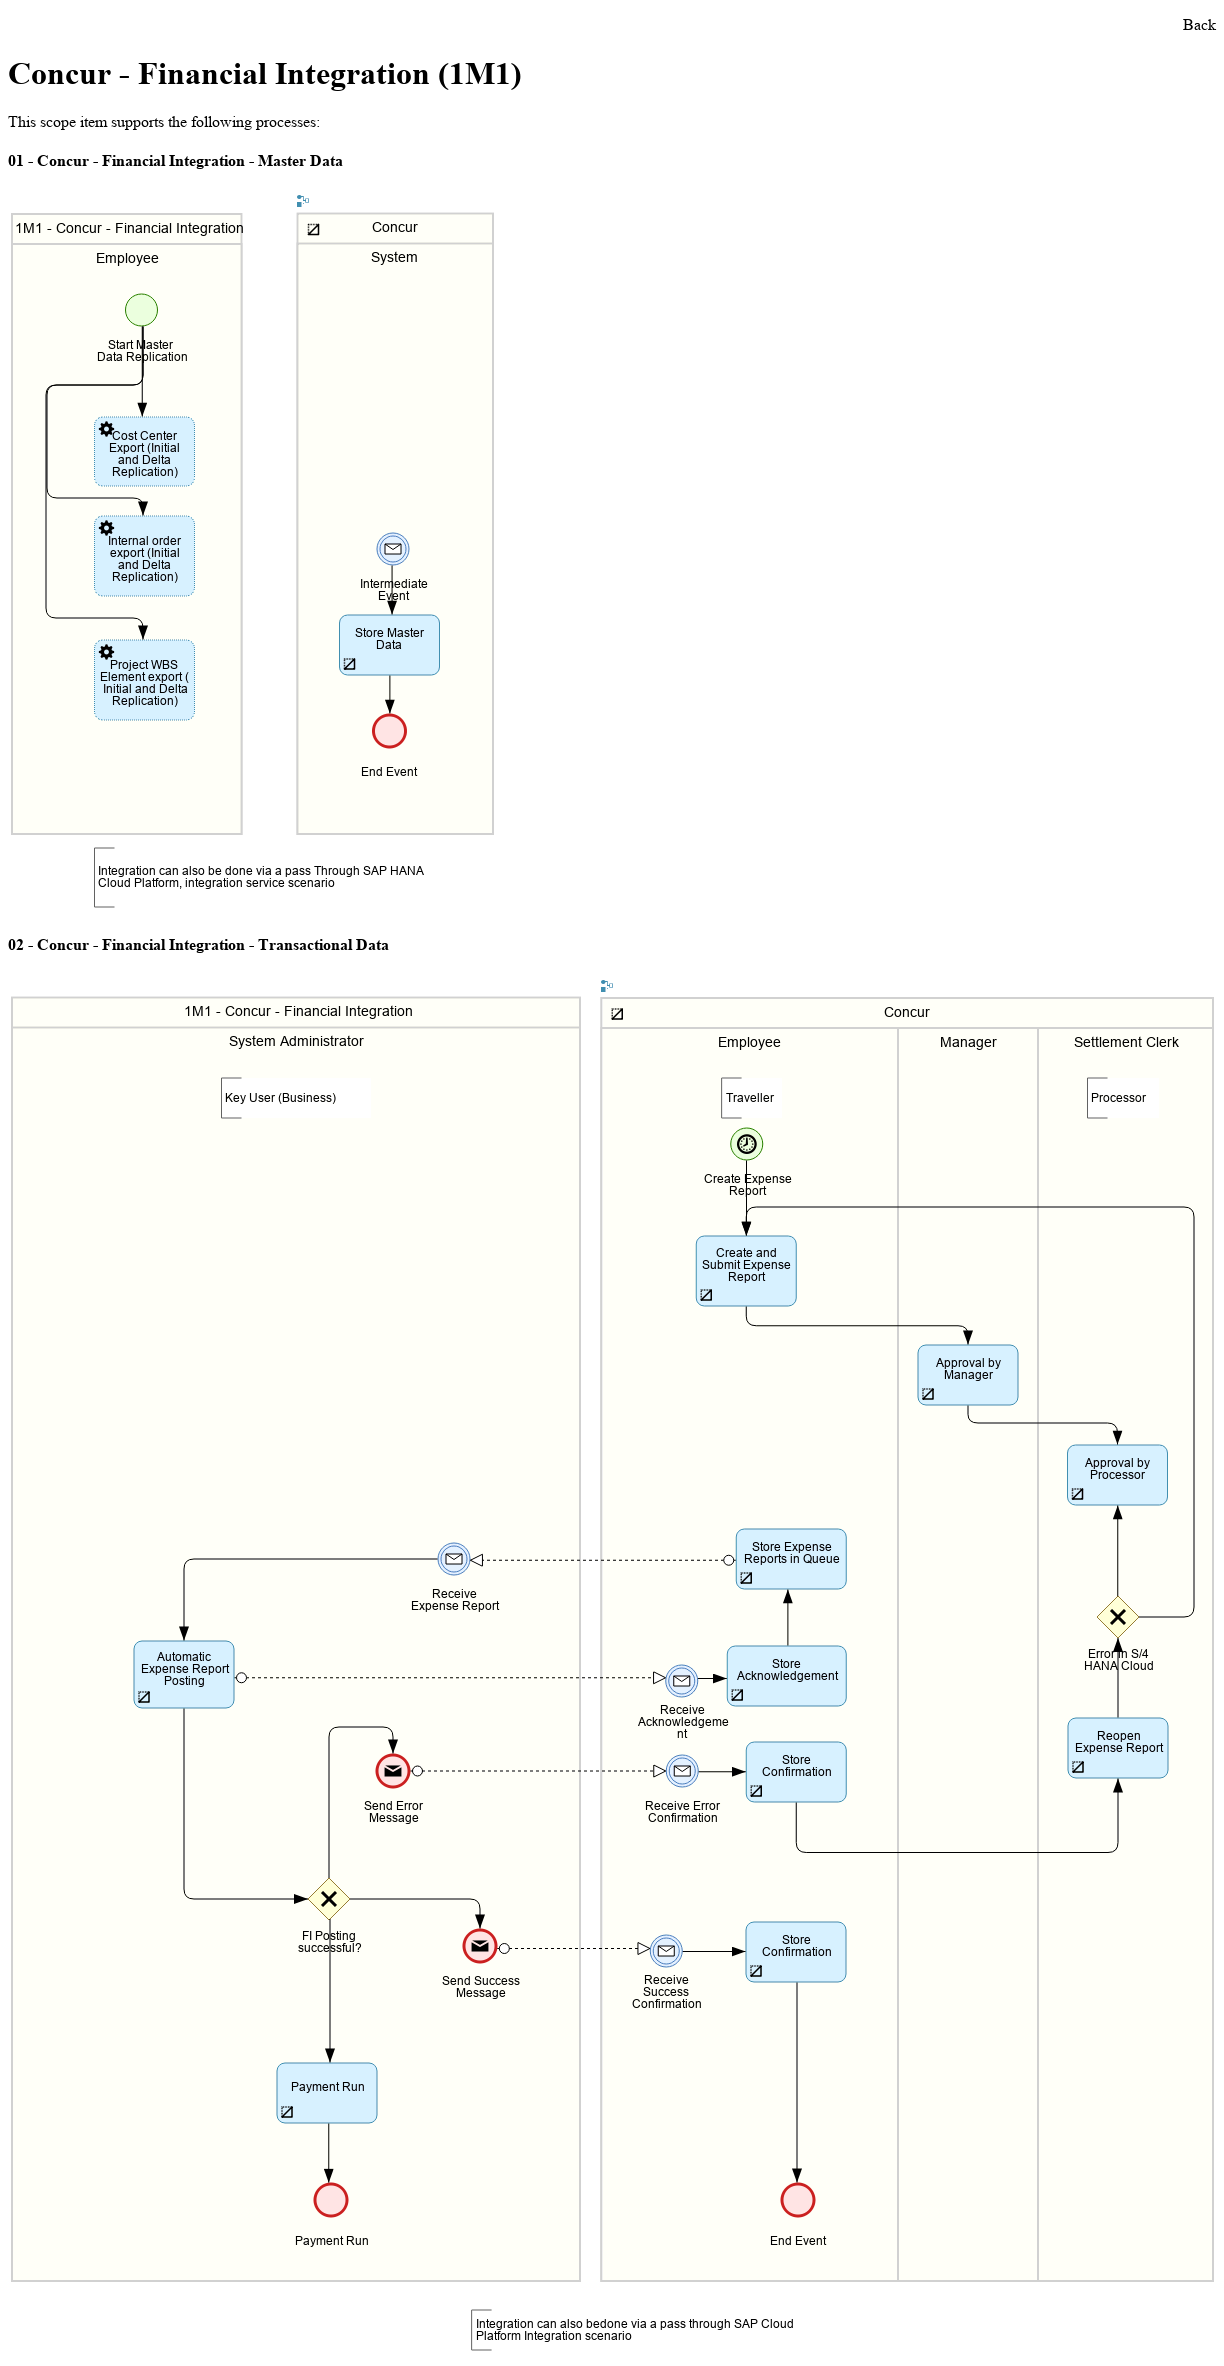 Concur - Financial Integration function of S/4HANA Cloud